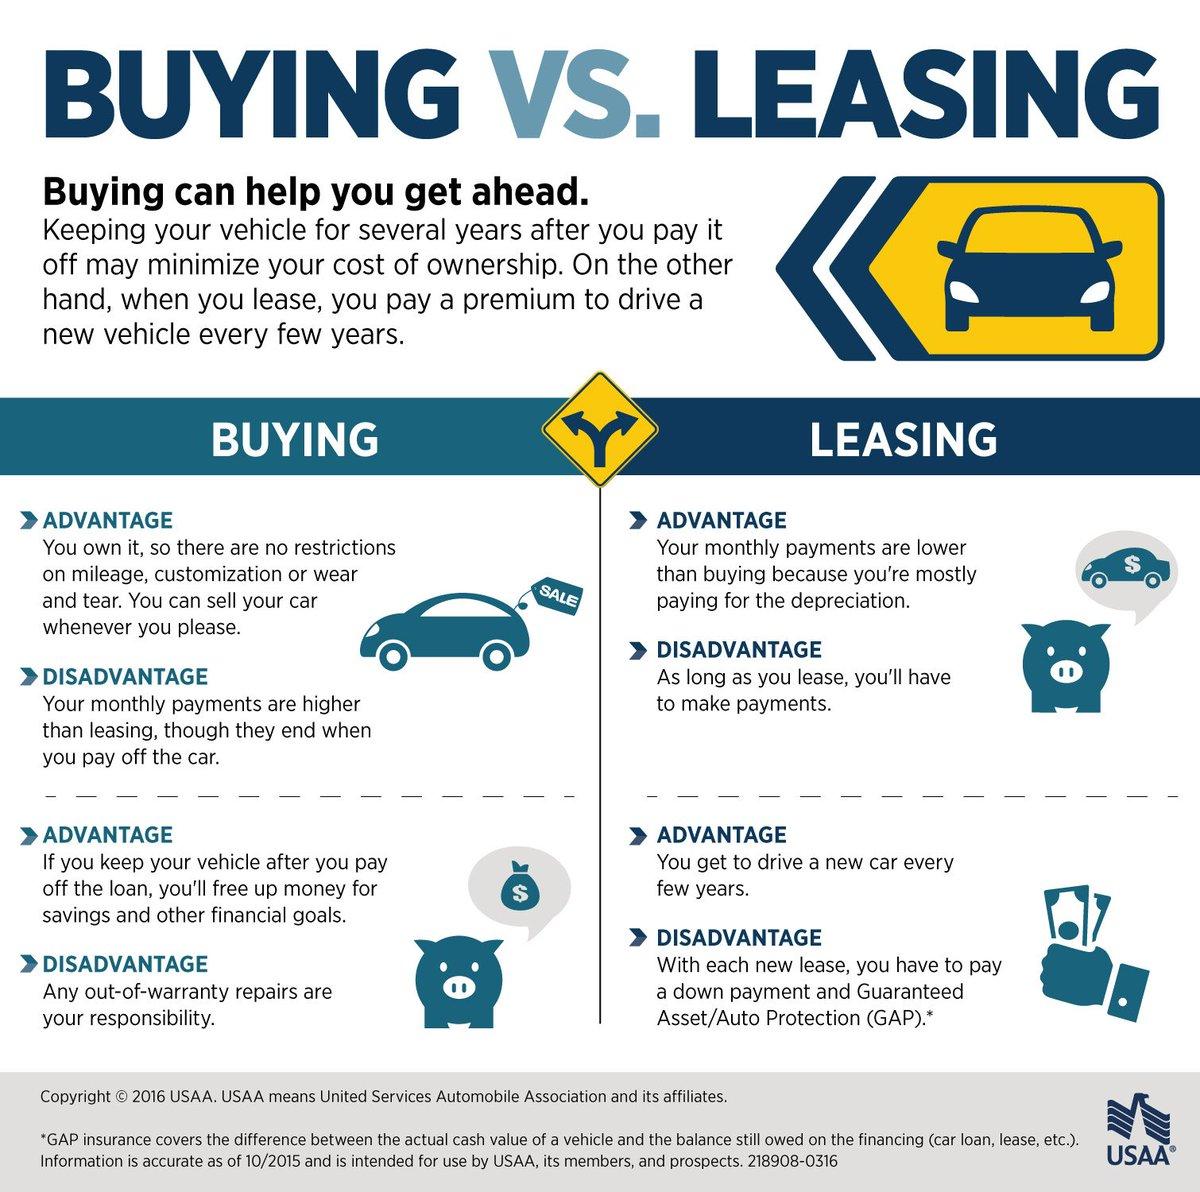 buying a car versus leasing a car